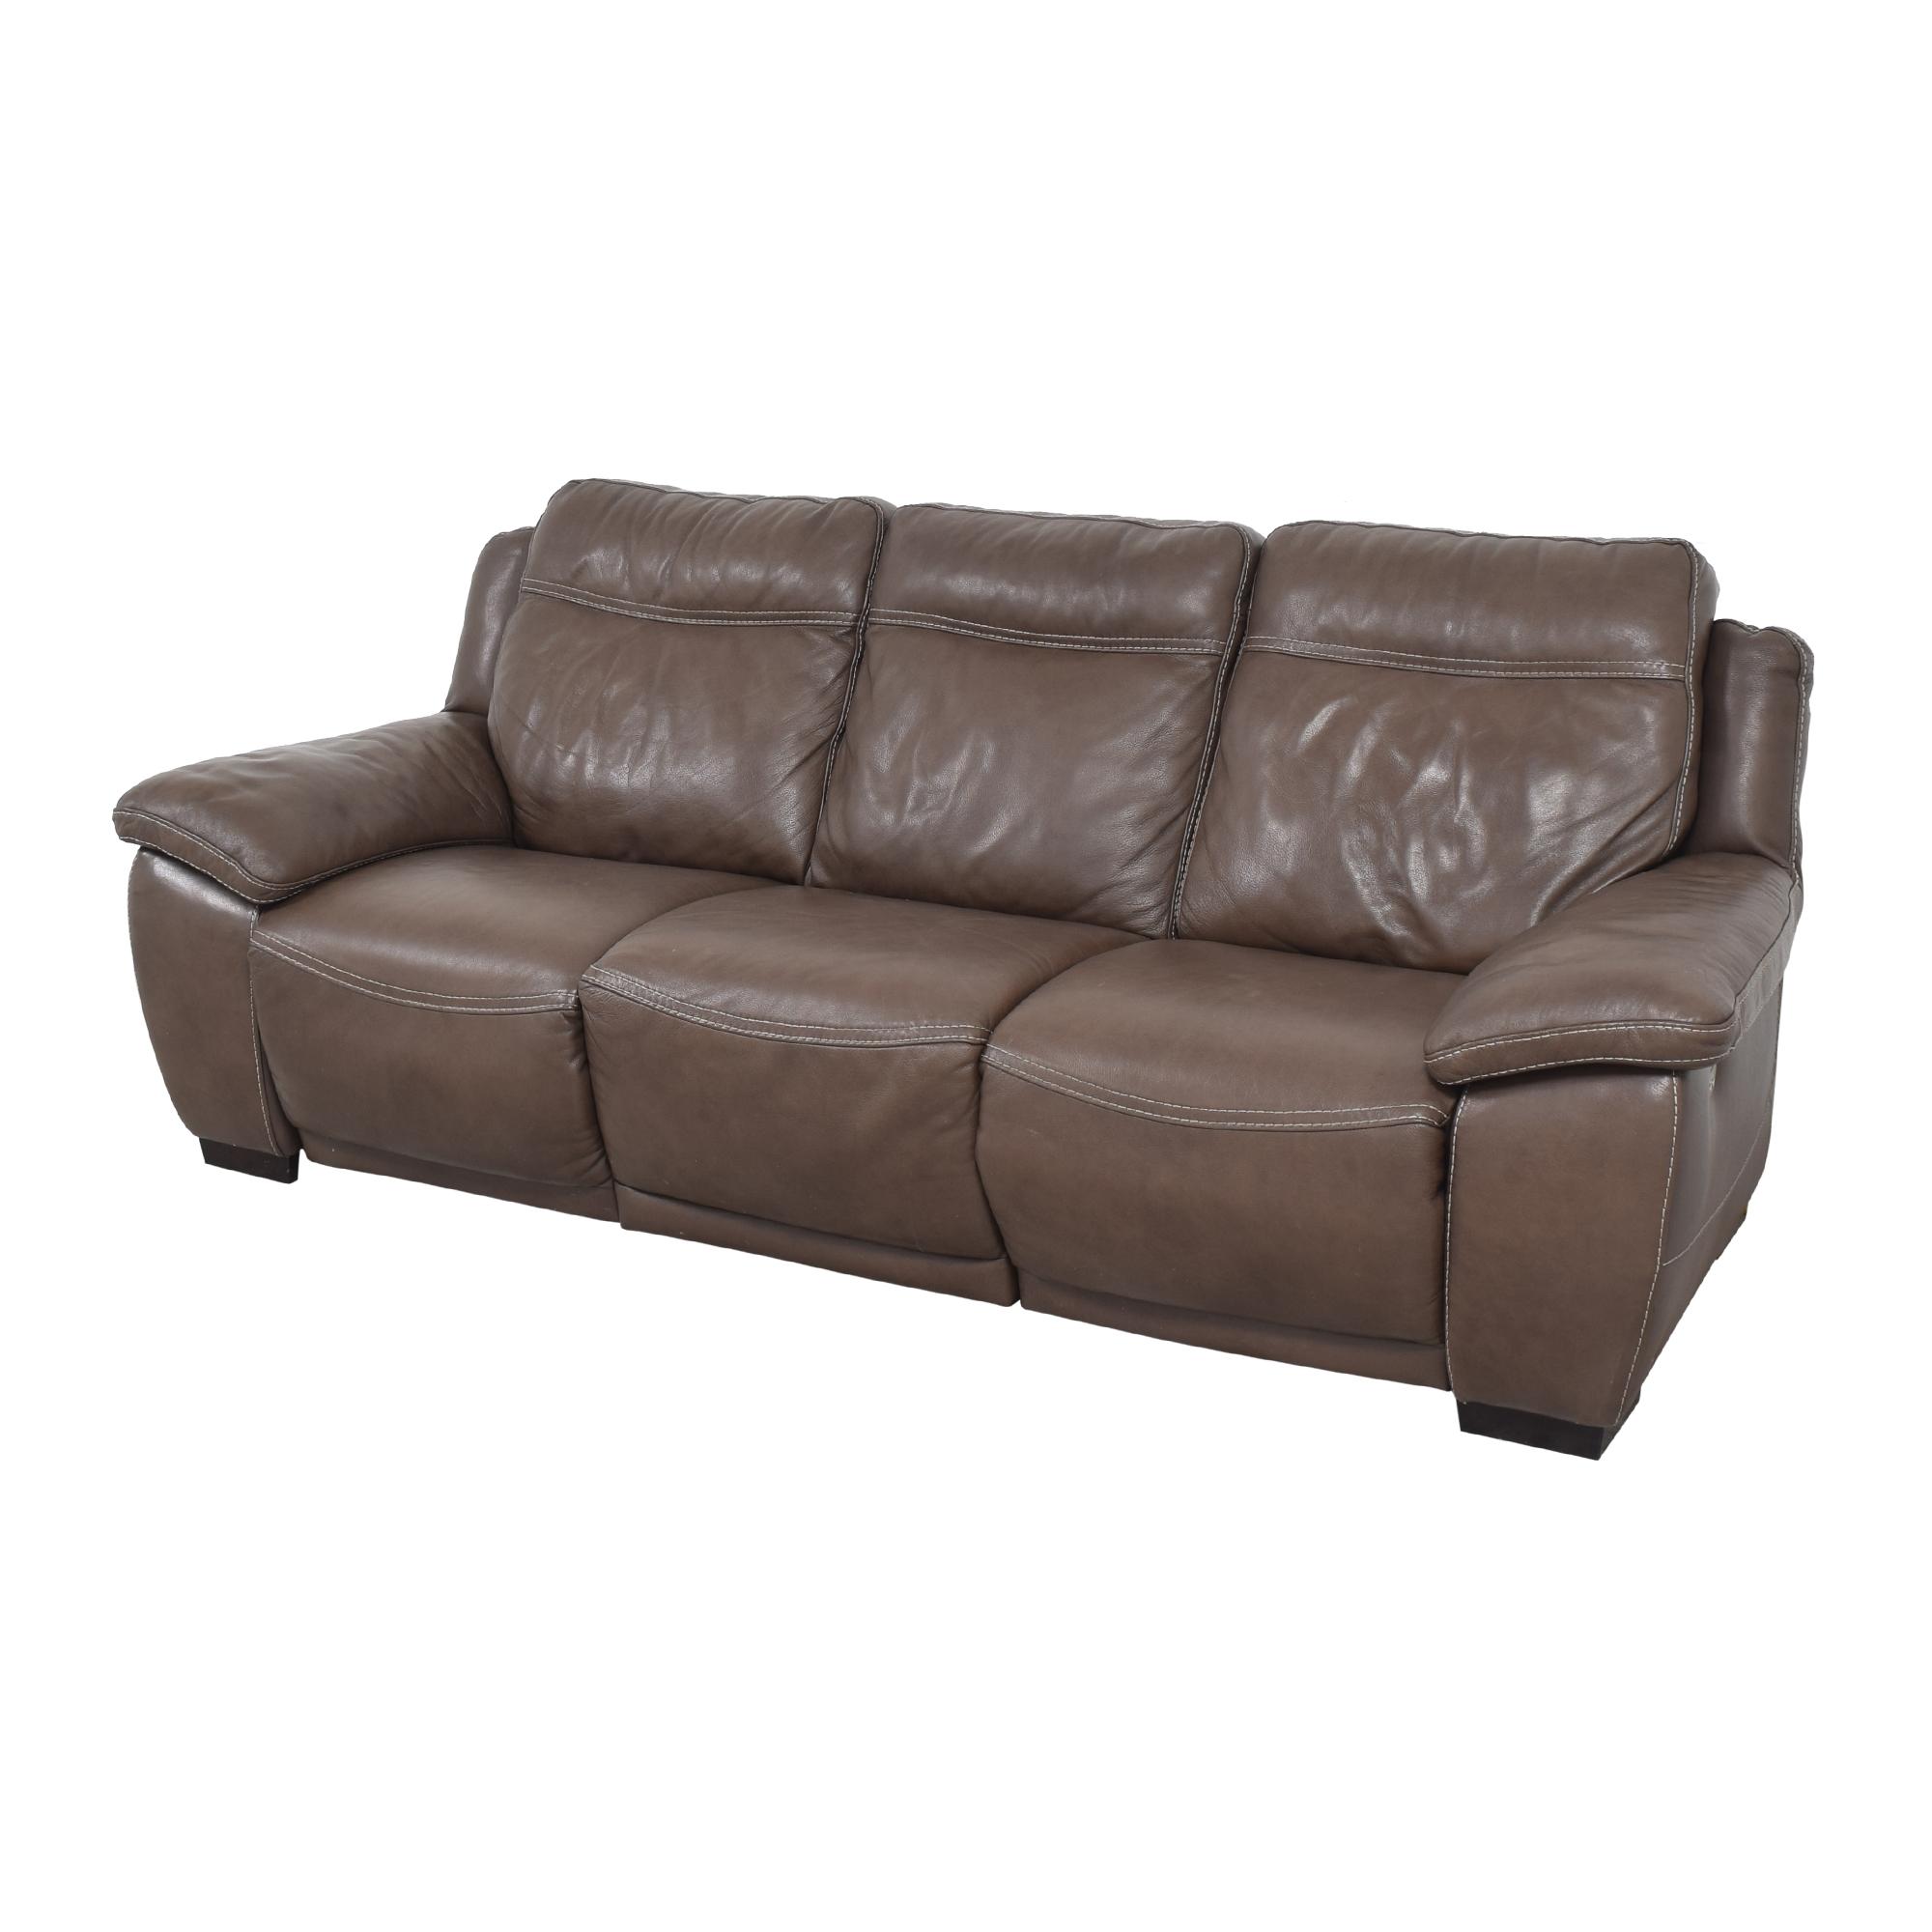 buy Natuzzi Three Cushion Reclining Sofa Natuzzi